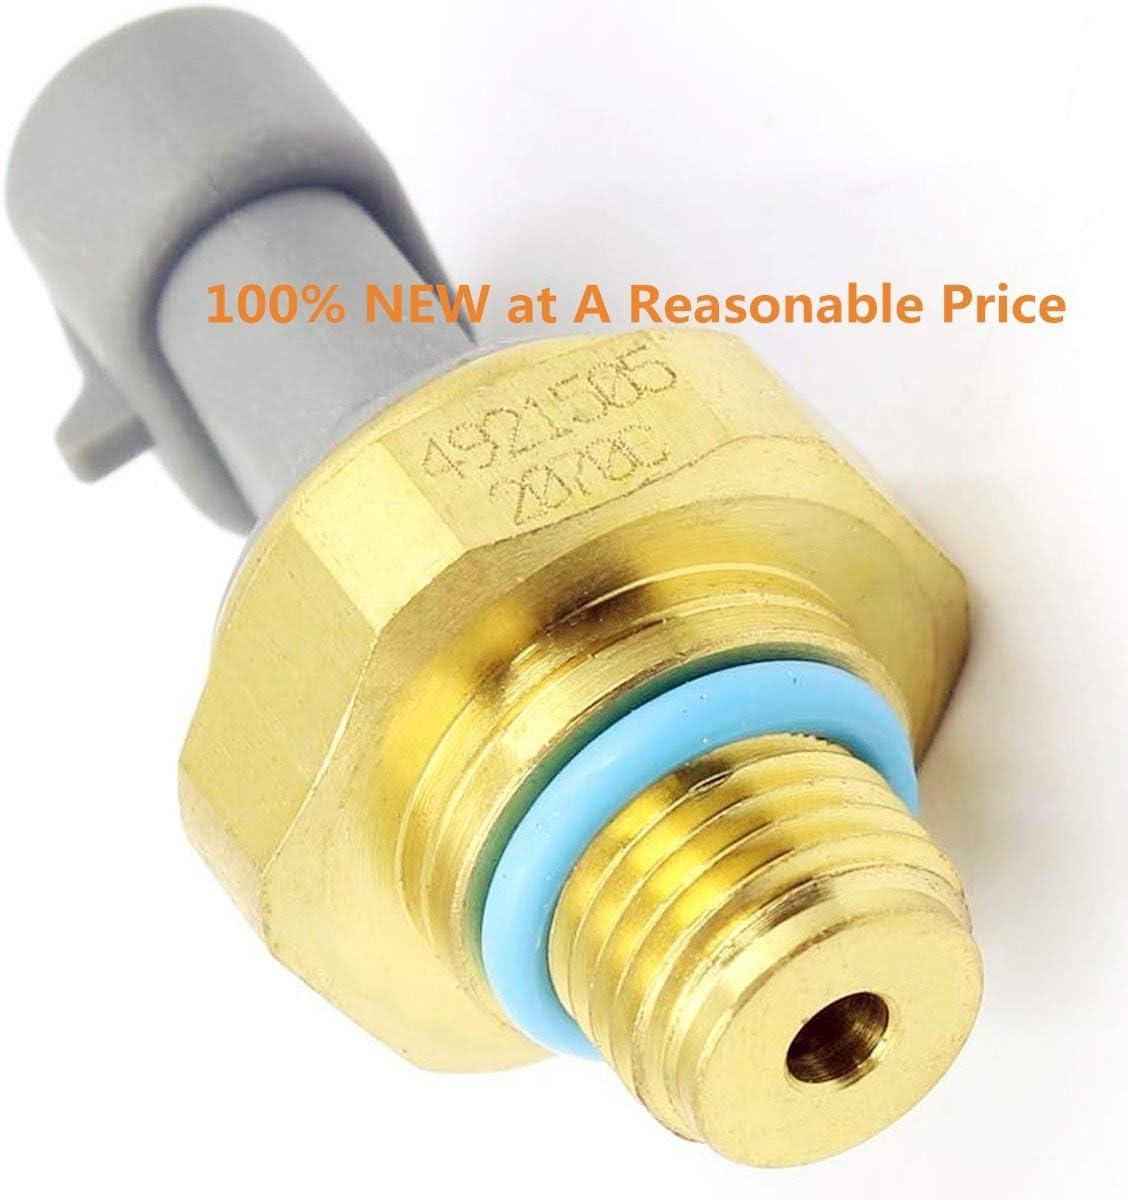 Map Sensor Turbocharger Boost Sensor for Dodge Ram 2500 3500 2000-2002 5.9L Cummins Diesel Turbocharged Replaces 4921505 Supreme Quality